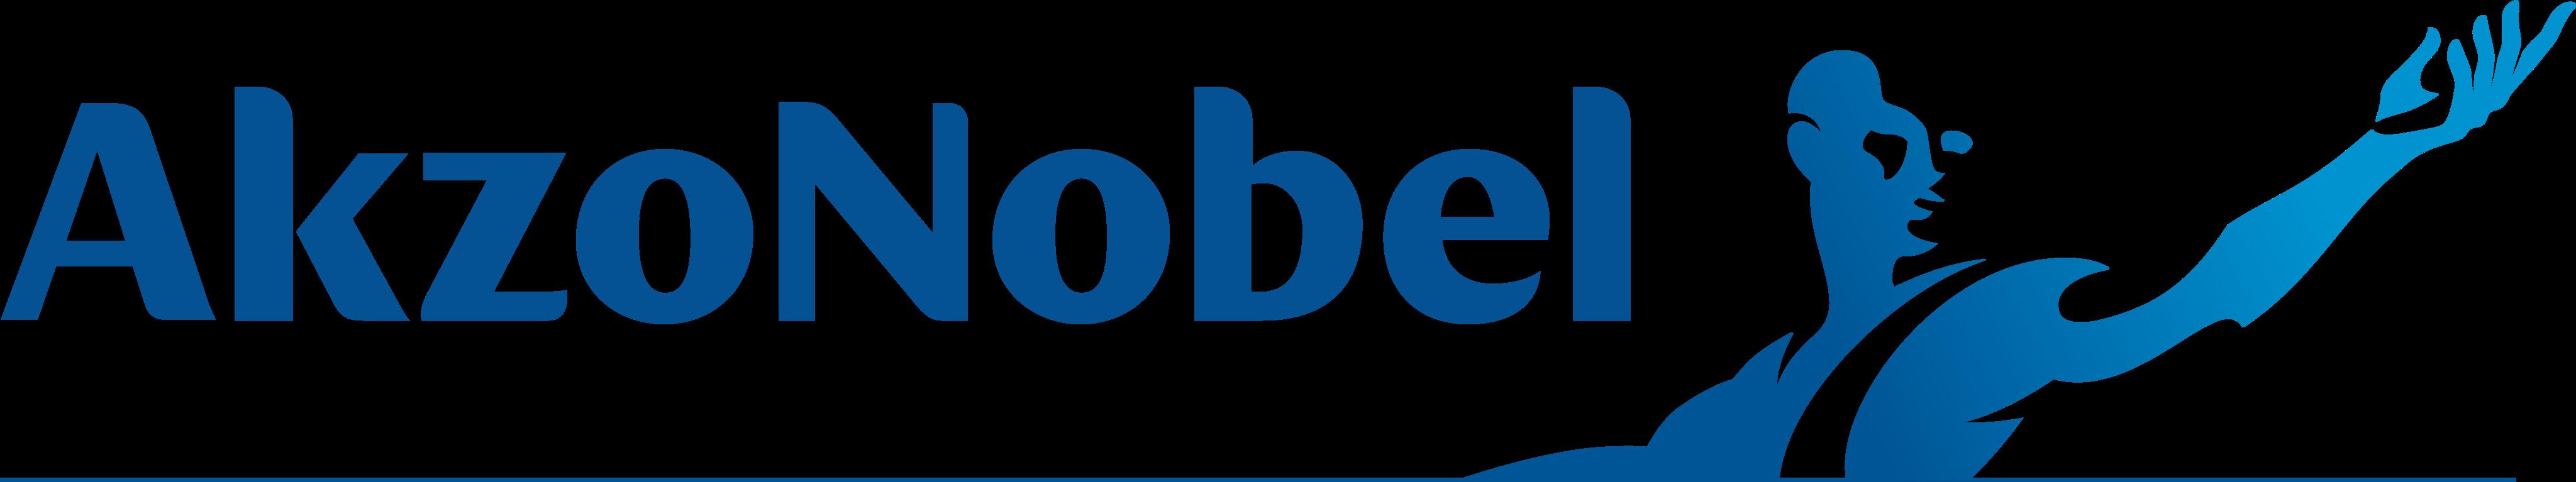 akzo nobel logo - AkzoNobel Logo